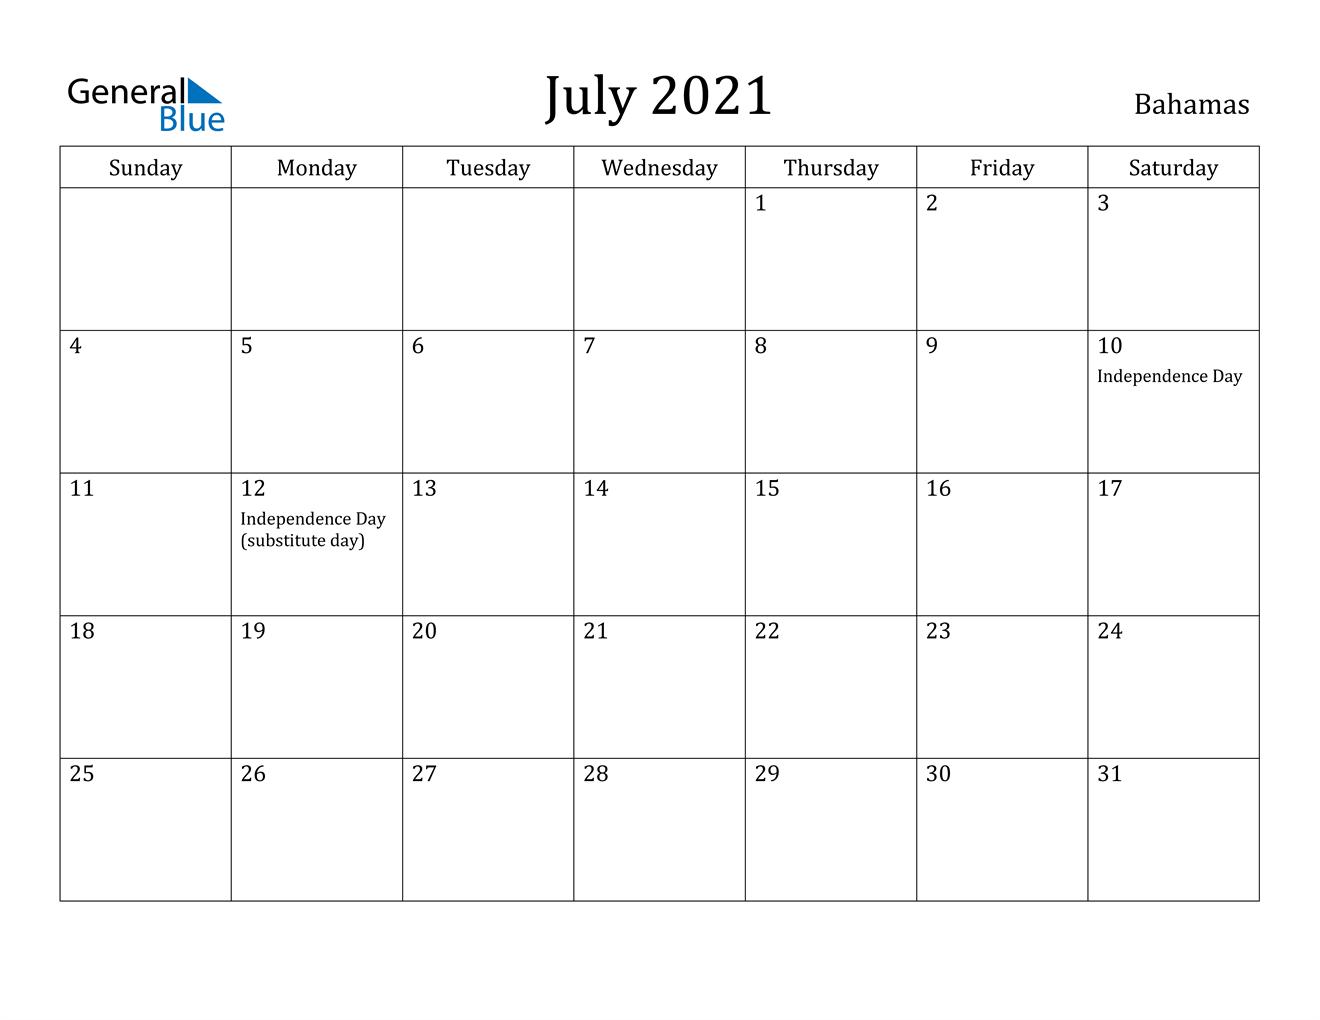 July 2021 Calendar - Bahamas